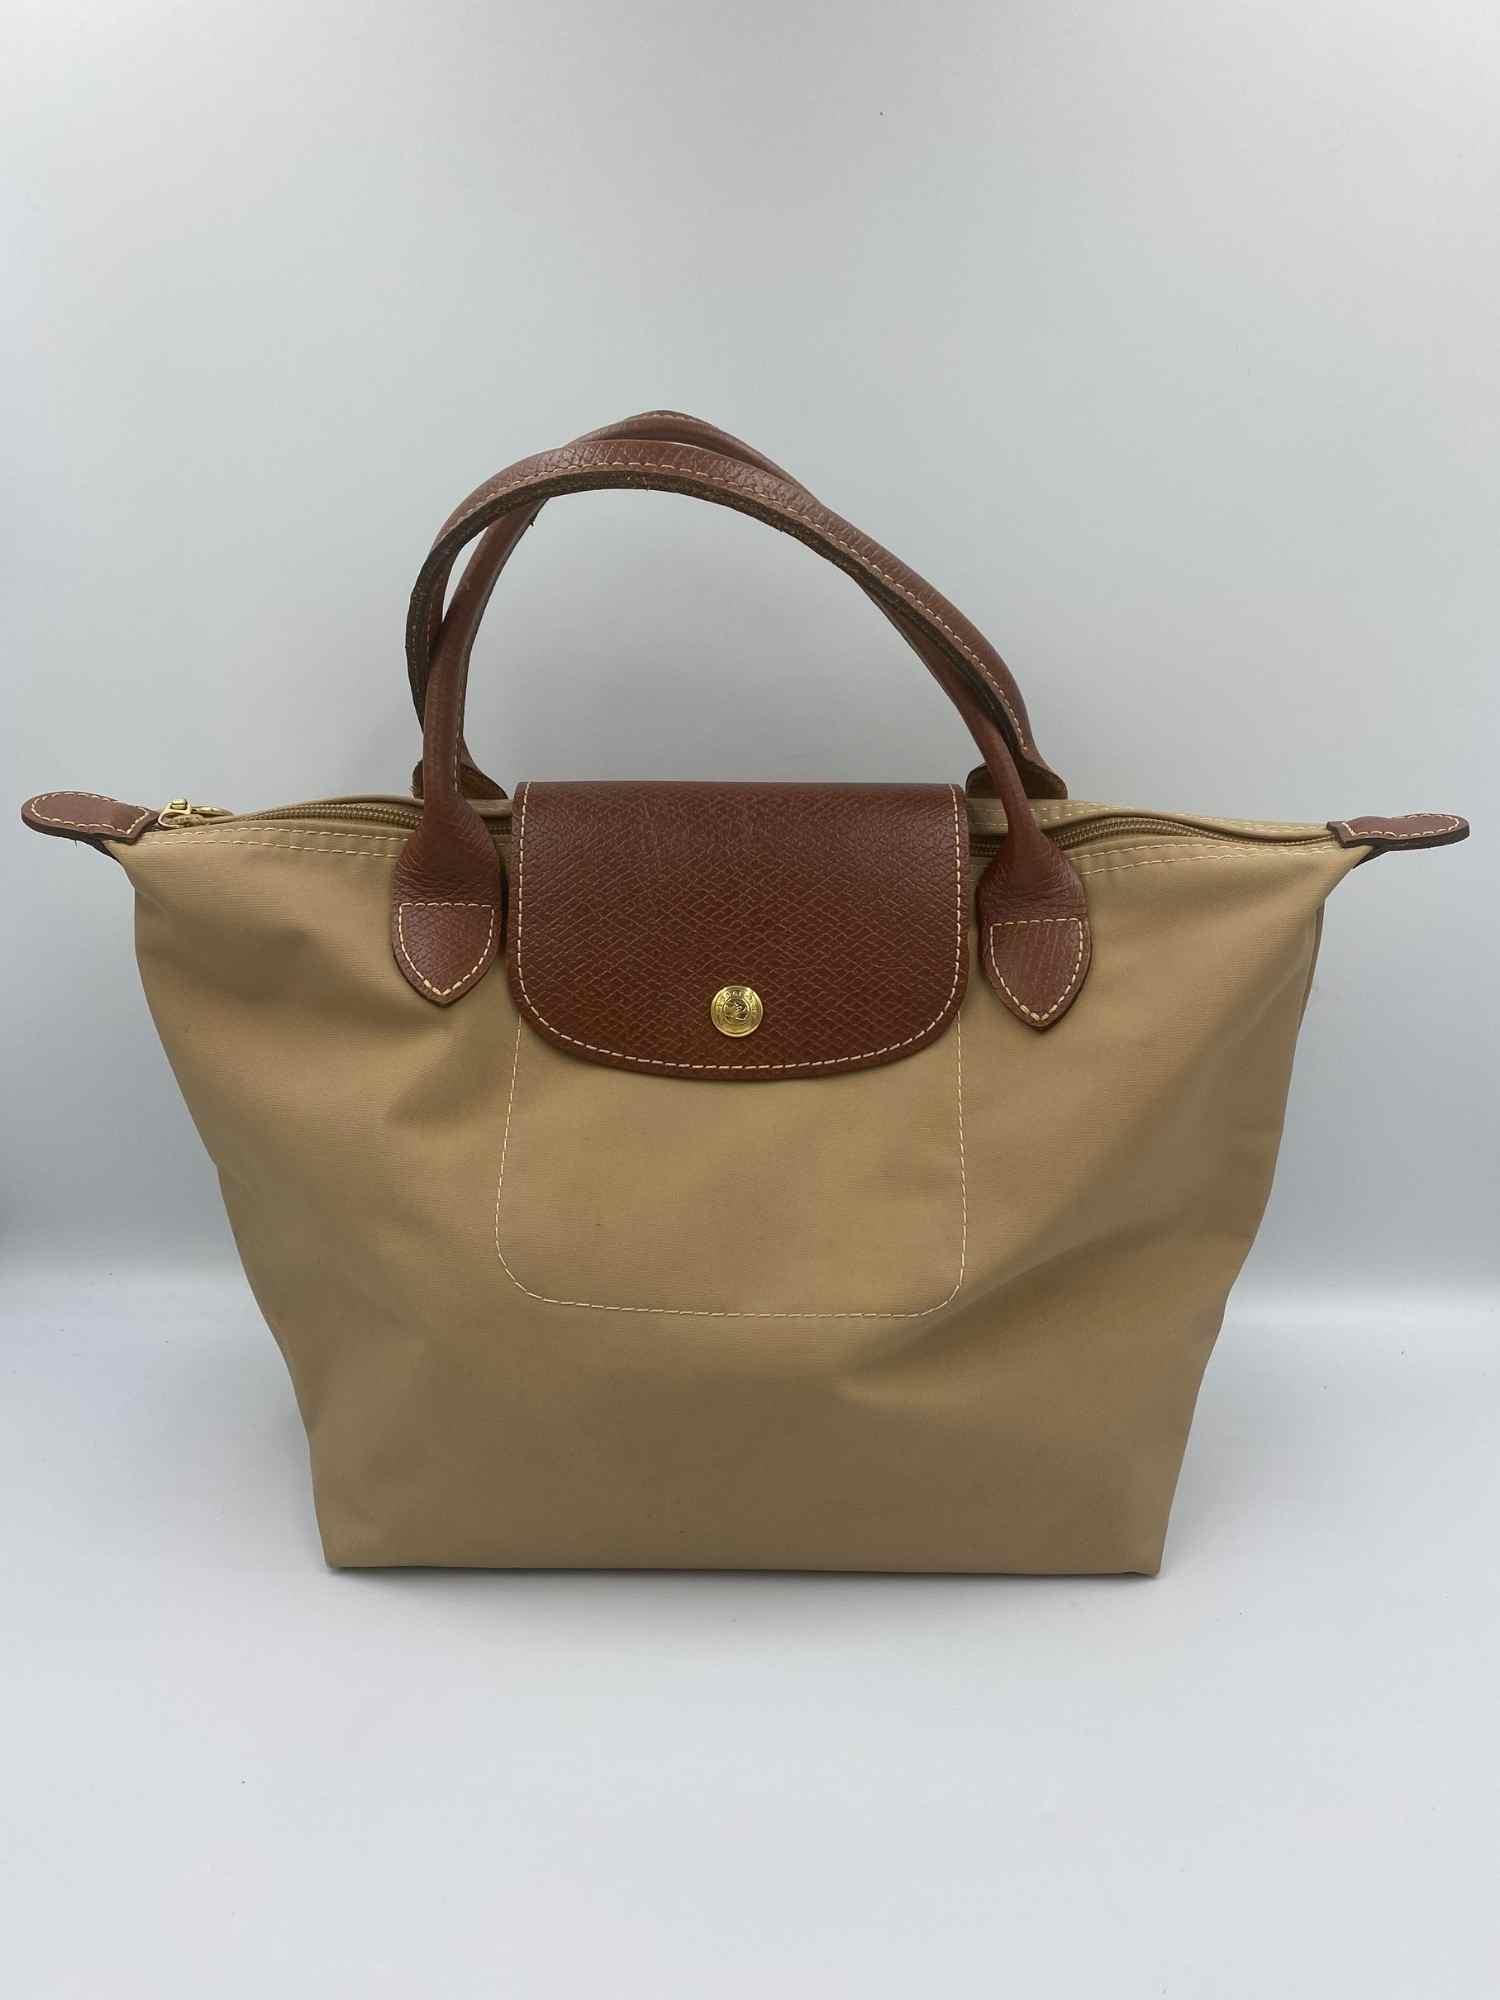 Bolsa Longchamp Le Pliage Bege Pequena